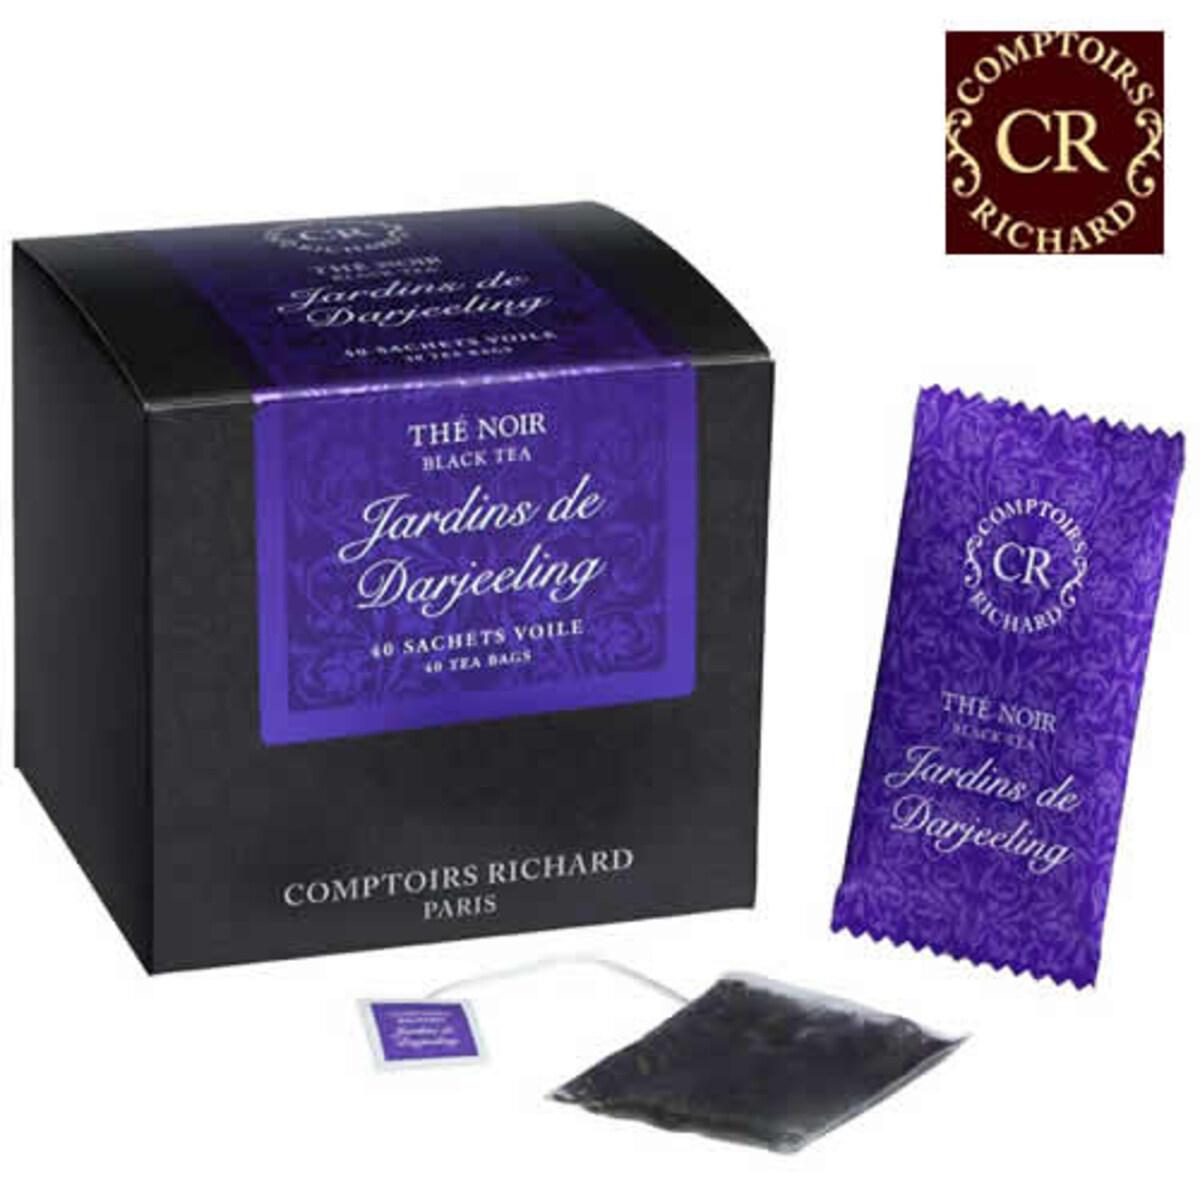 Comptoirs Richard Jardins de Darjeeling - 40бр сашета черен чай